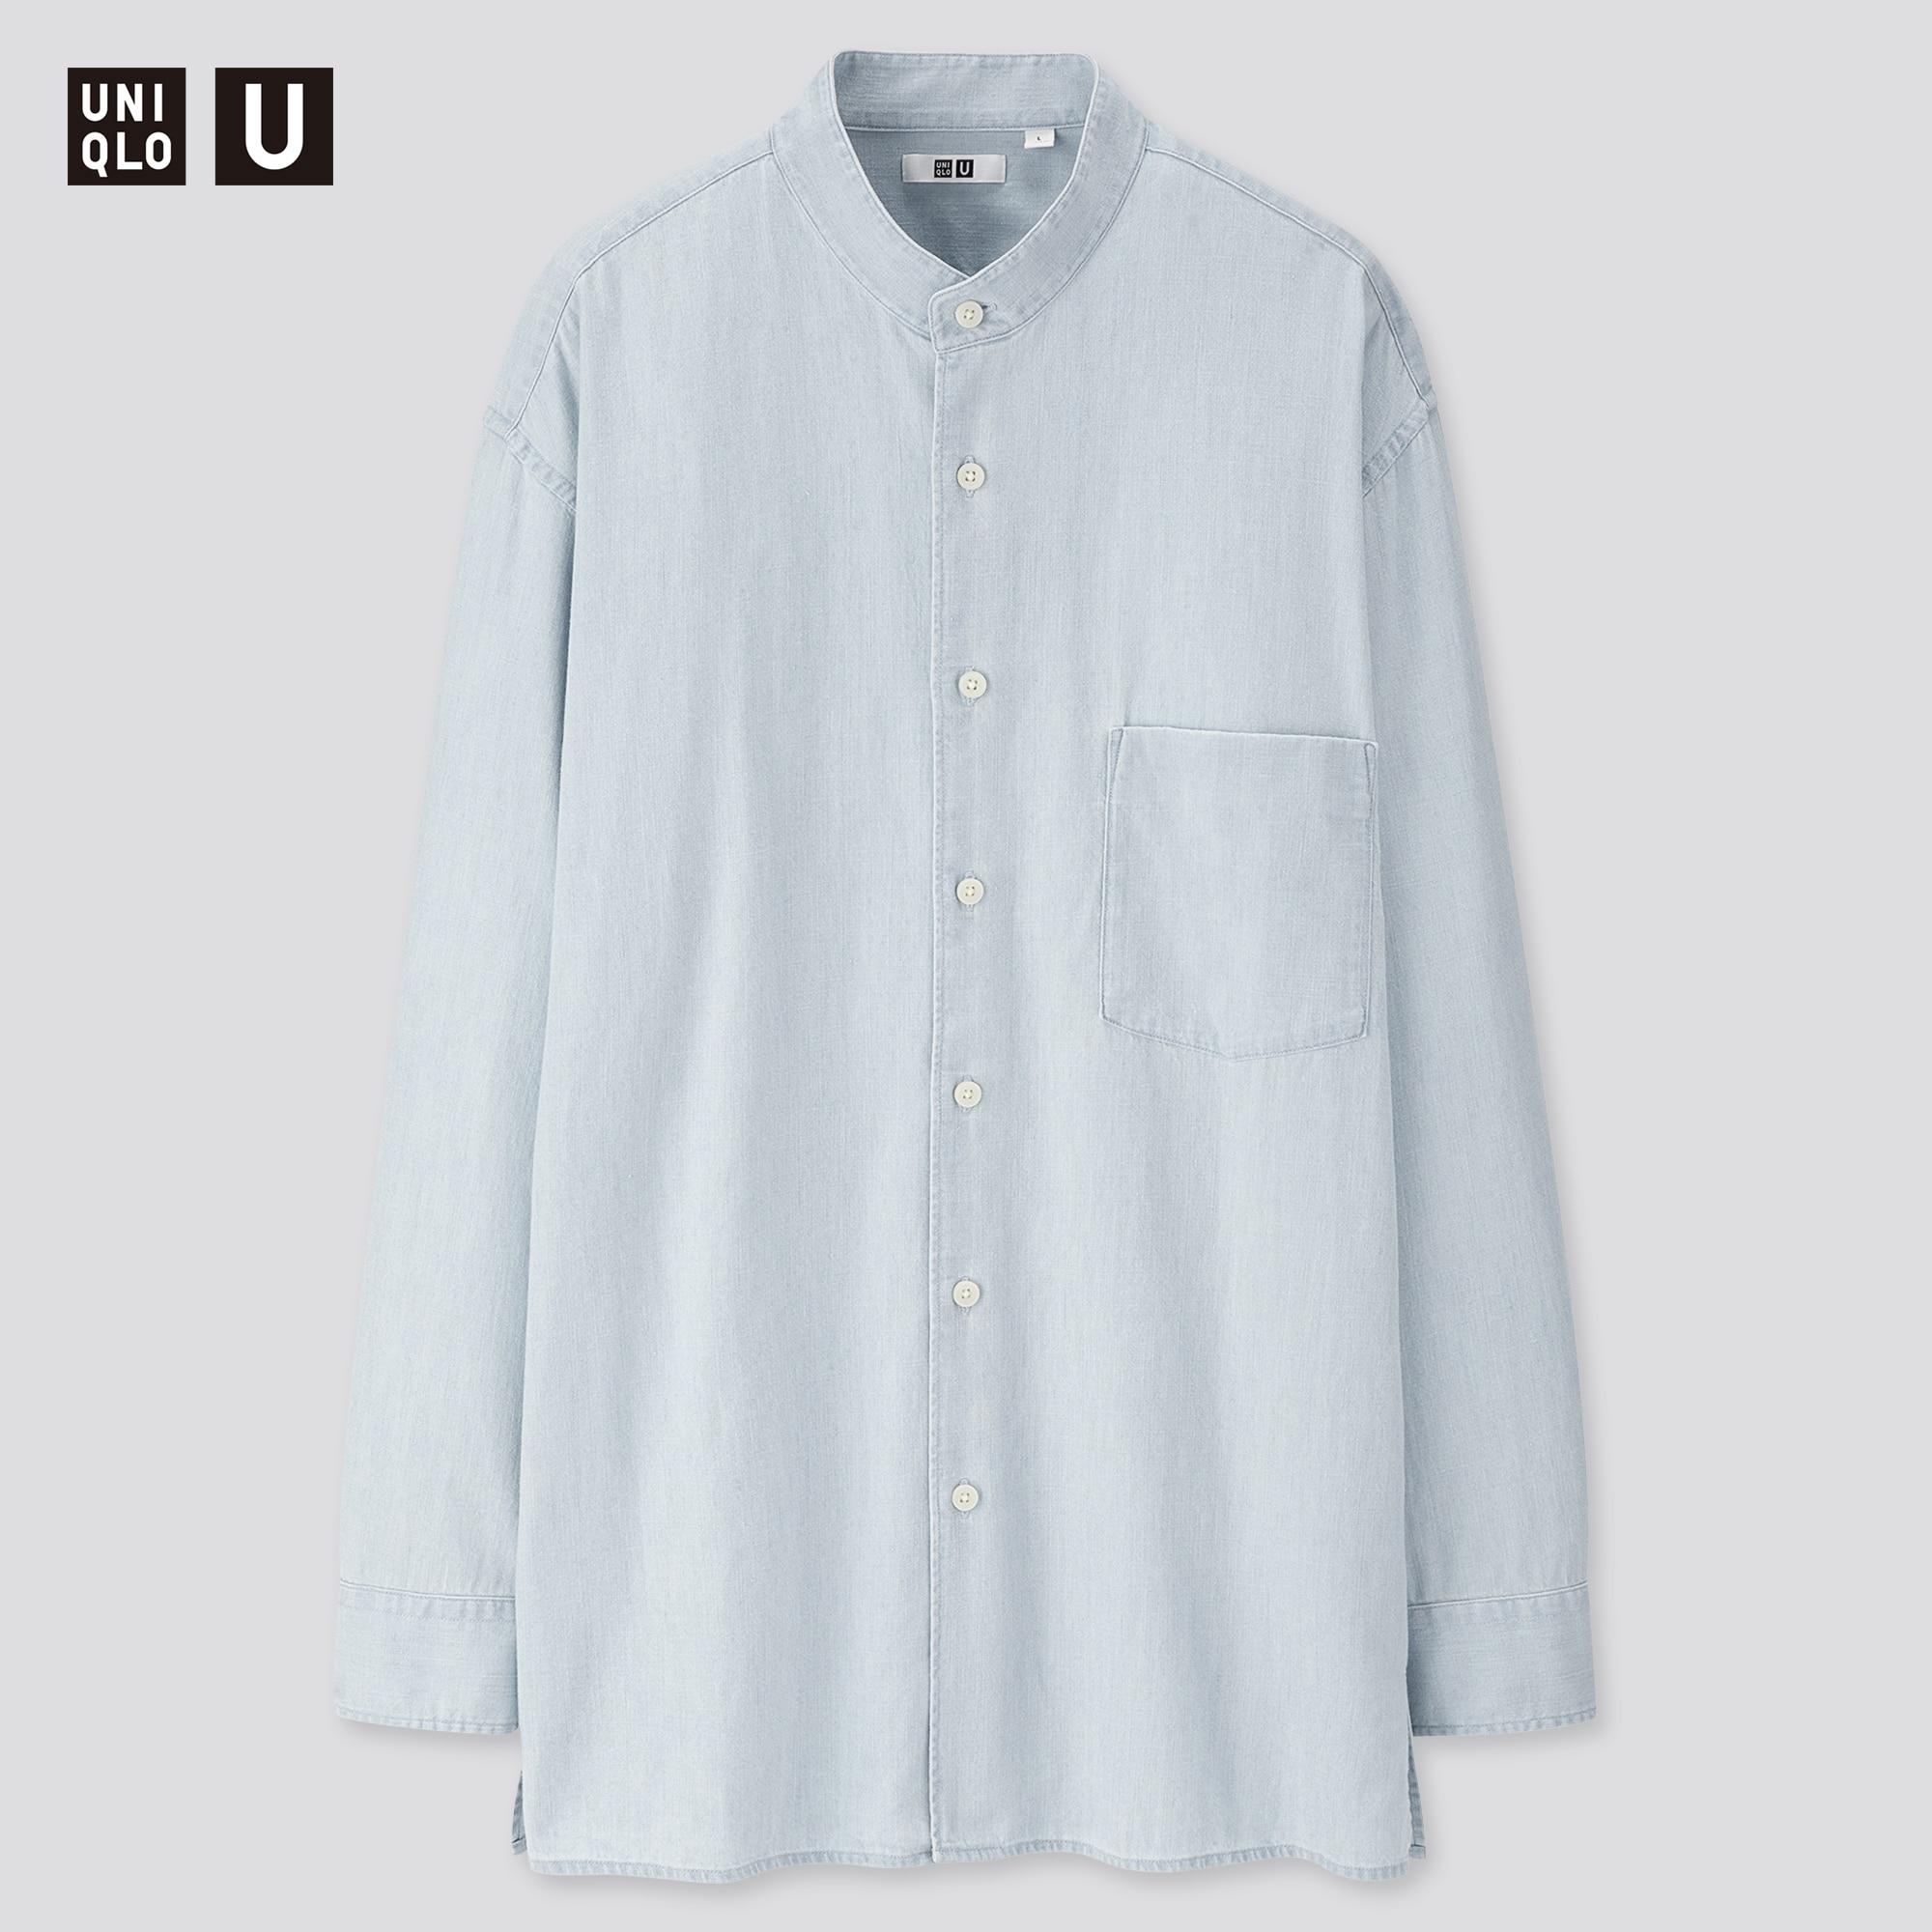 Uniqlo men u denim stand collar long-sleeve shirt